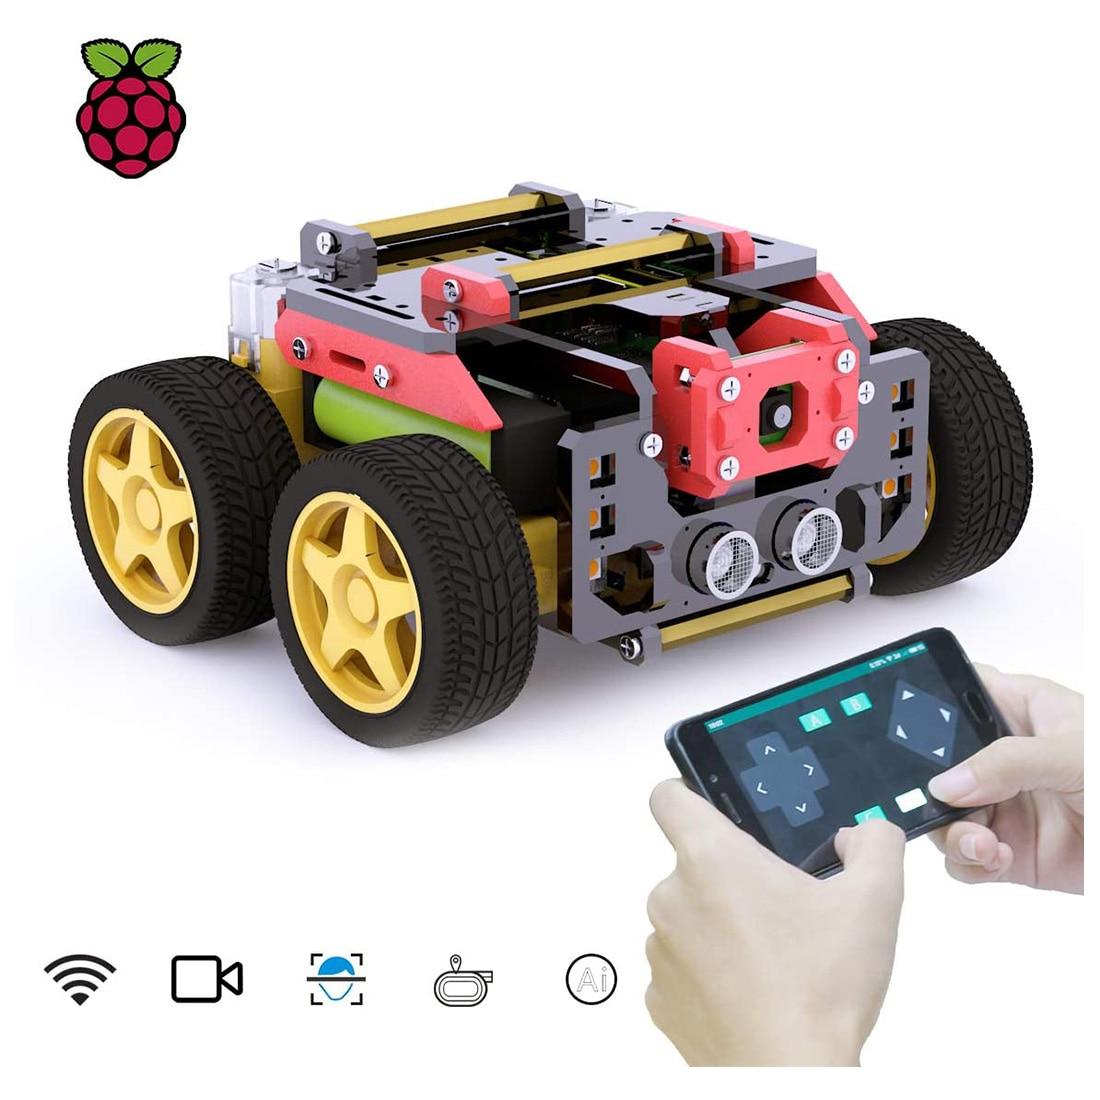 Adeept AWR 4WD WiFi Smart Robot Car Kit DIY Robot with OpenCV Target Tracking Real-Time Video Transmission Function Stem Robot